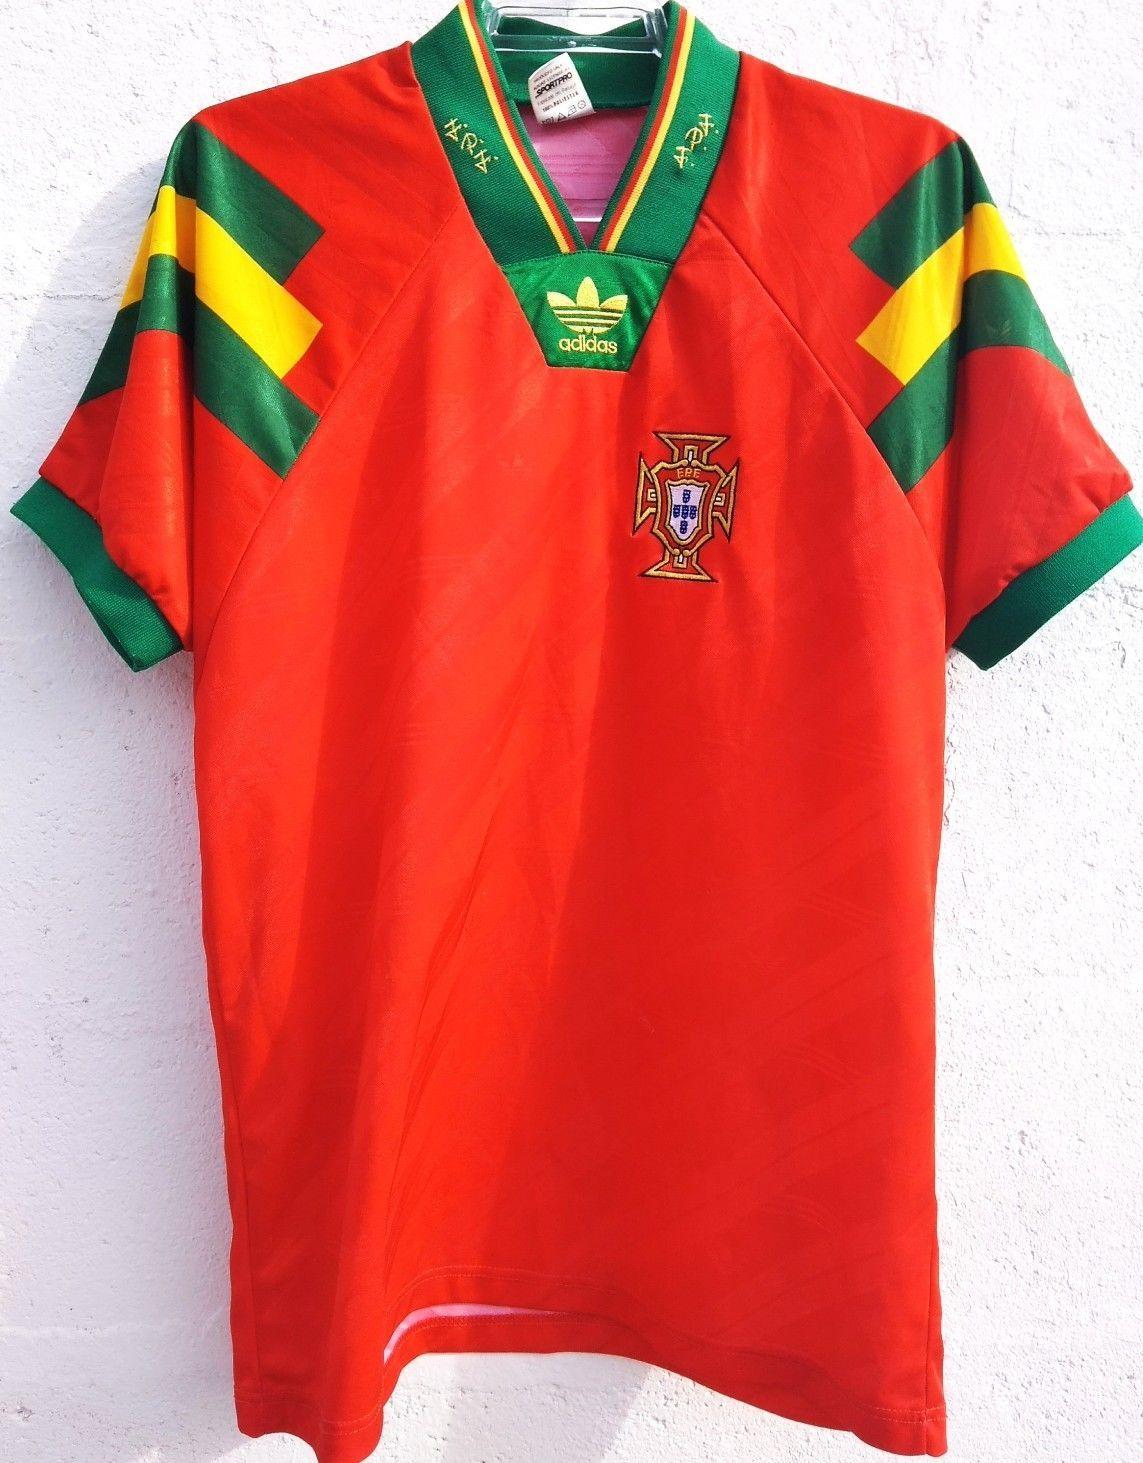 be93c0ece 1993-1994 PORTUGAL ADIDAS HOME FOOTBALL SHIRT PORTUGAL CAMISA FUTEBOL (SIZE  L )